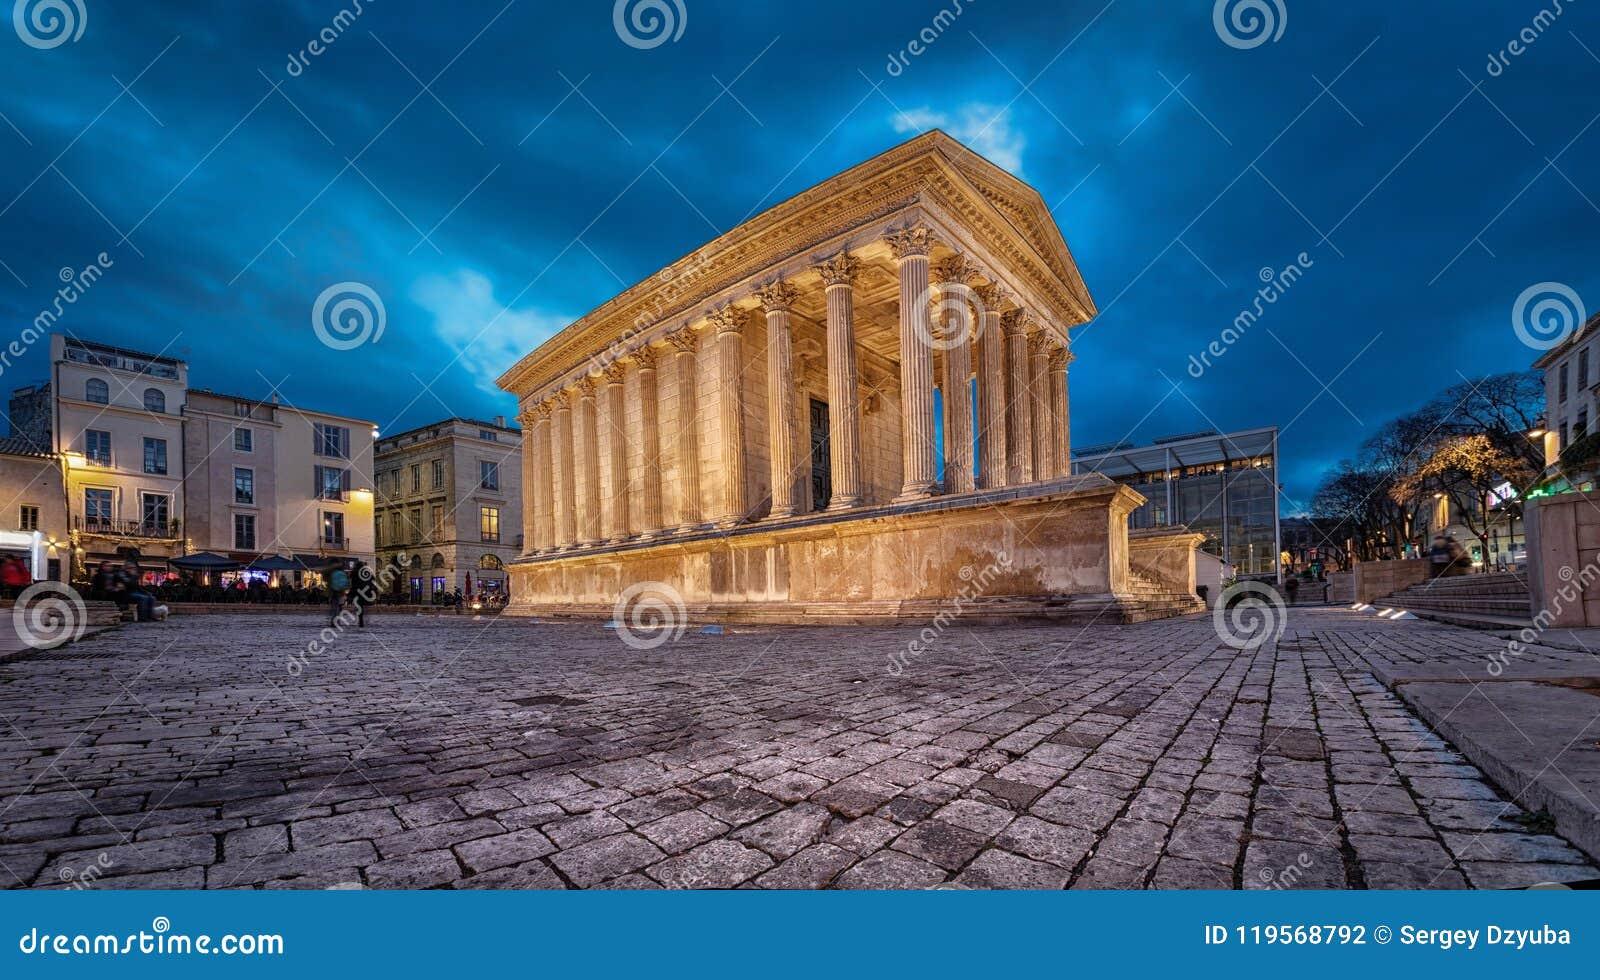 Maison Carree - восстановленный римский висок в Nimes, Франции